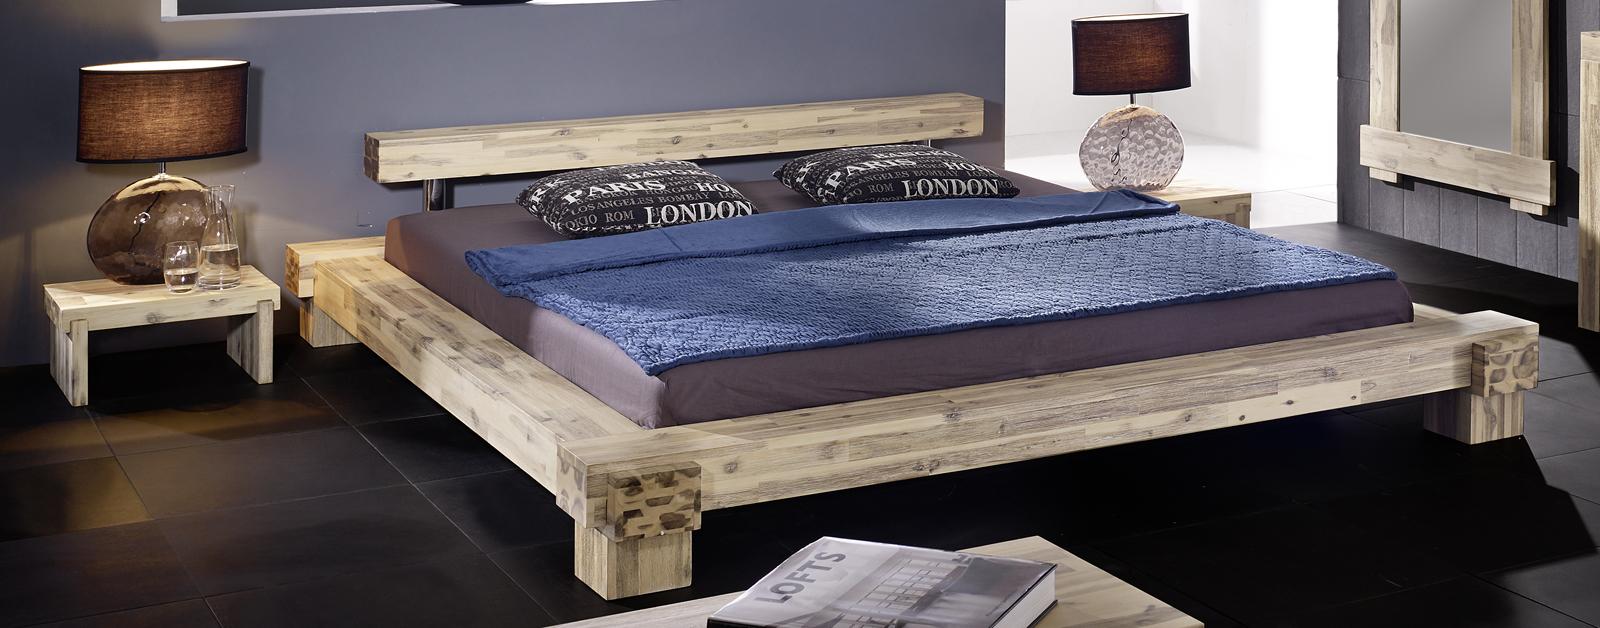 Holzbett massiv 180x200  SAM® Massives Holzbett Akazie weiß lasiert 180 x 200 cm Lolita